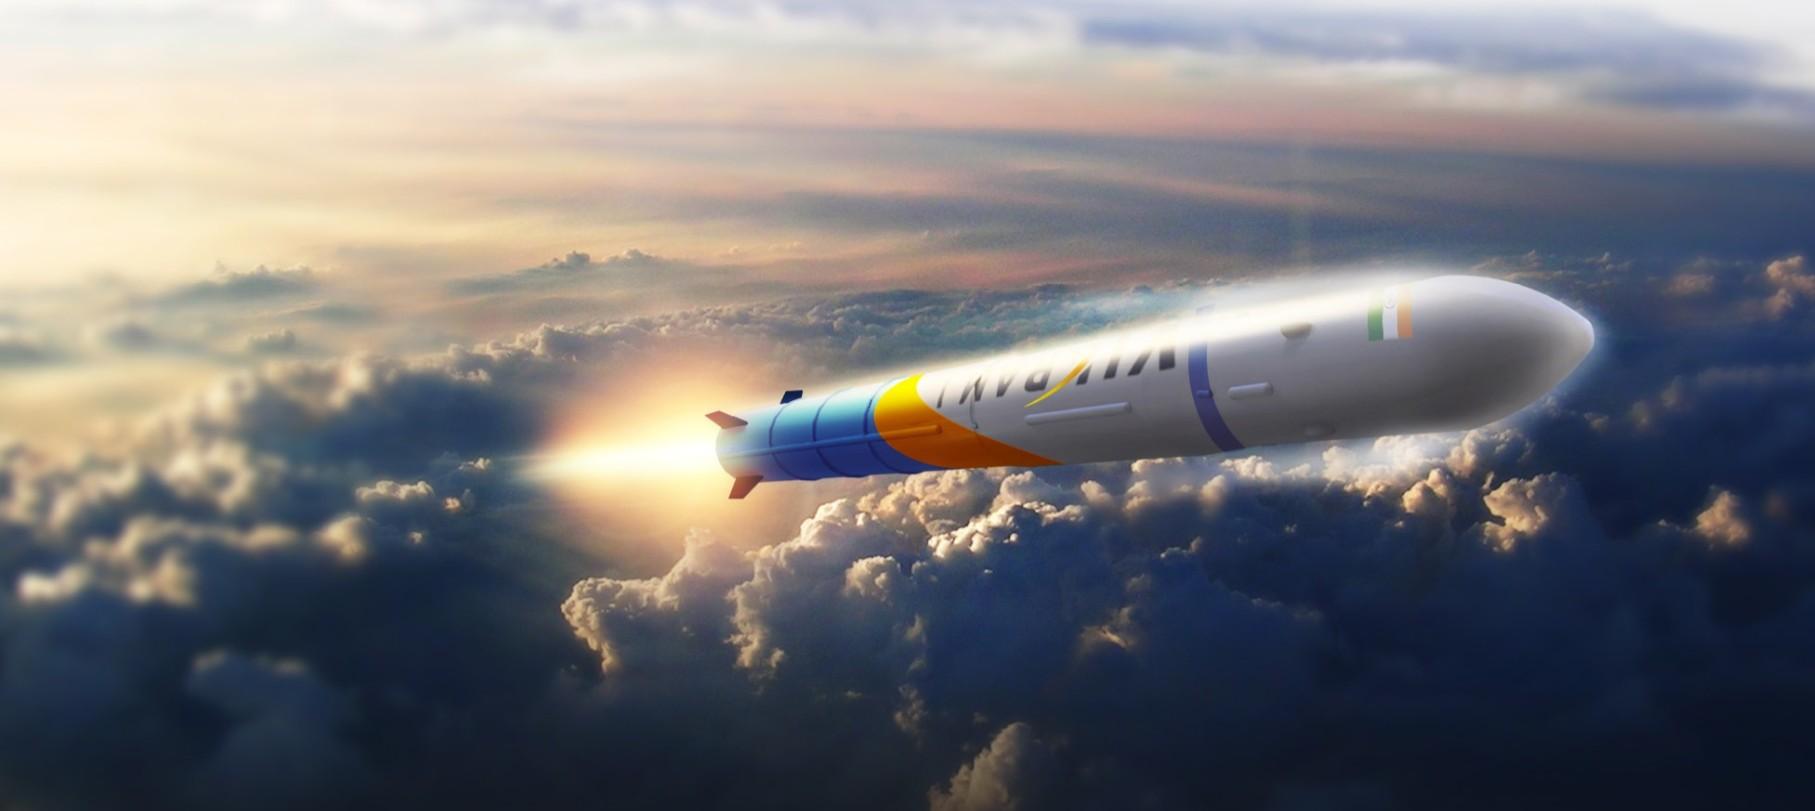 Skyroot Aerospace正在为印度建造进入太空的通道